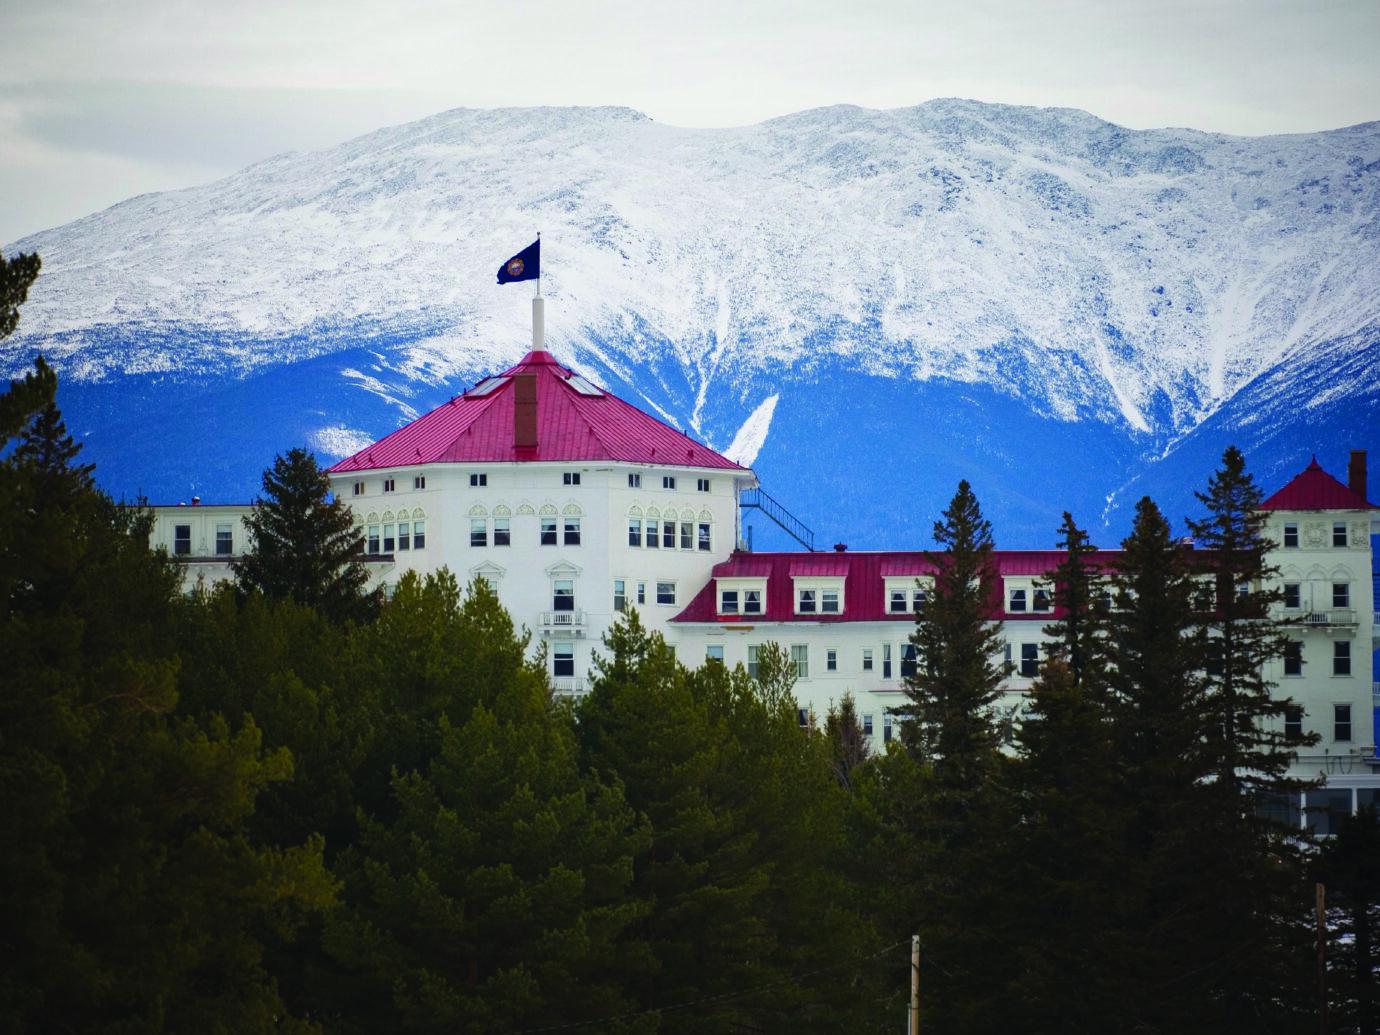 Exterior of Omni Mount Washington Resort, Bretton Woods, NH